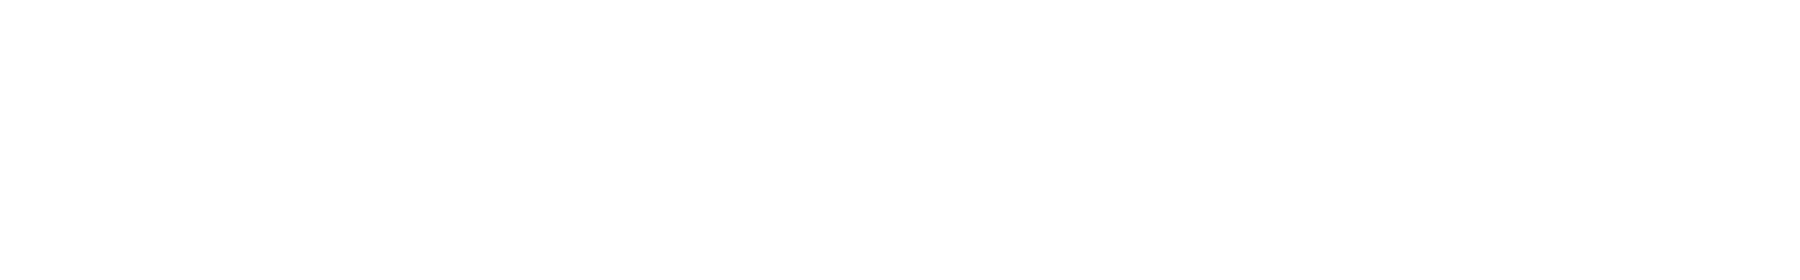 perc 1 59